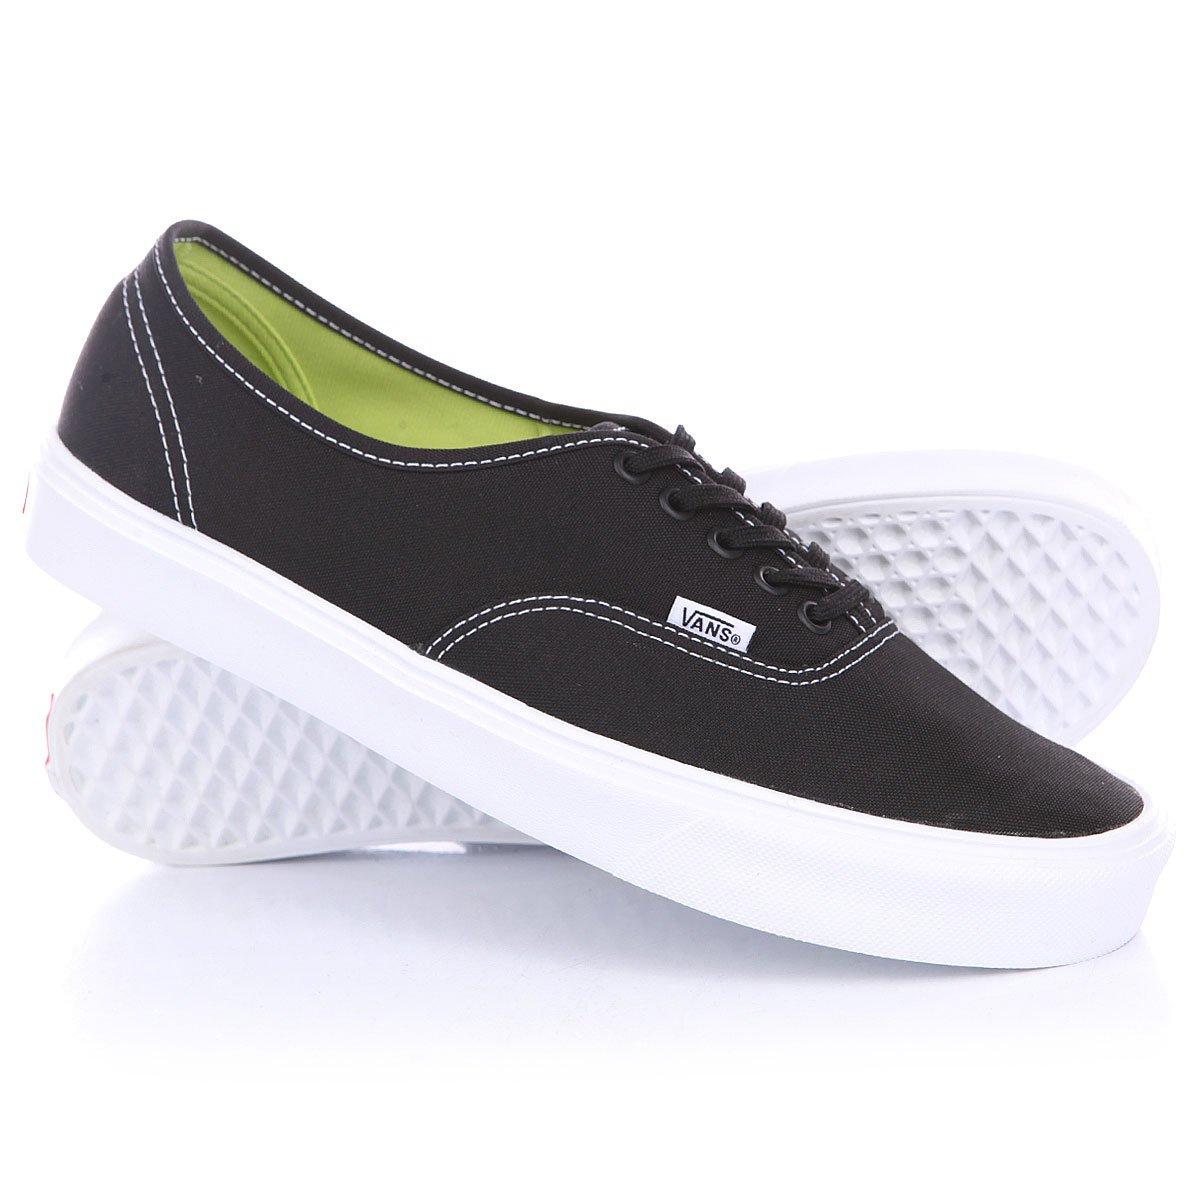 9ed7c2db8ee8 Купить кеды Vans Authentic Lite Black/True White в интернет-магазине ...